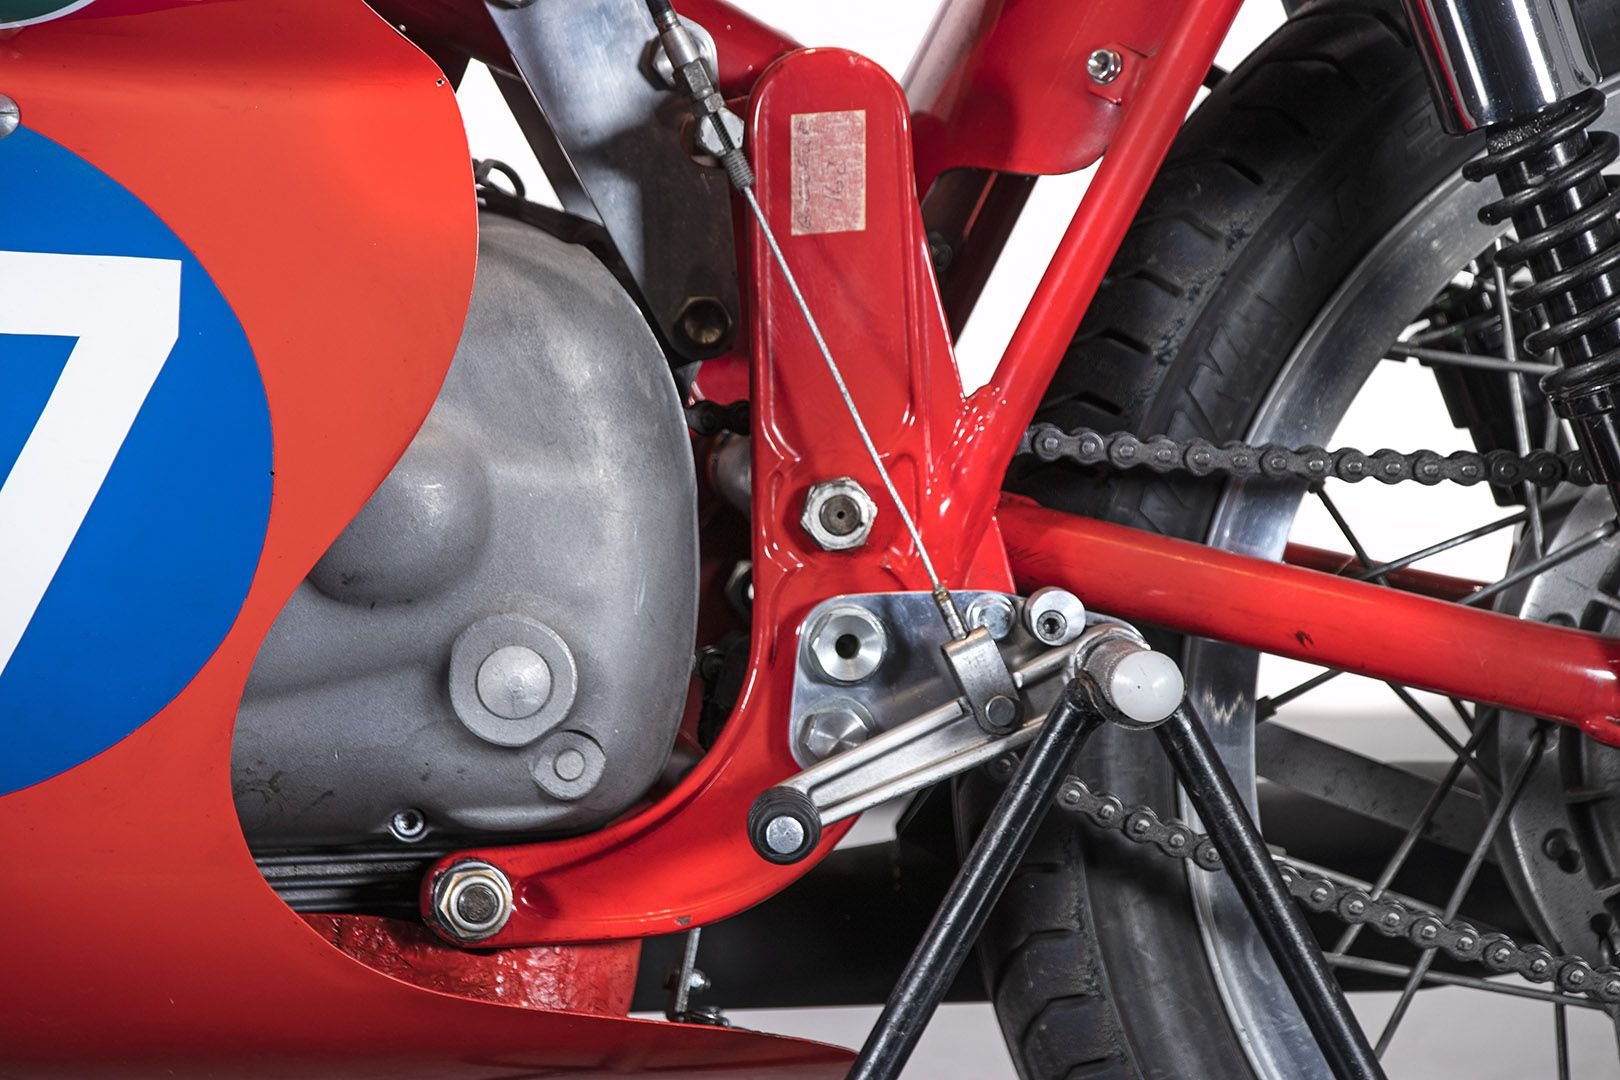 1969 Aermacchi Harley-Davidson 350 Ala d'oro 61120